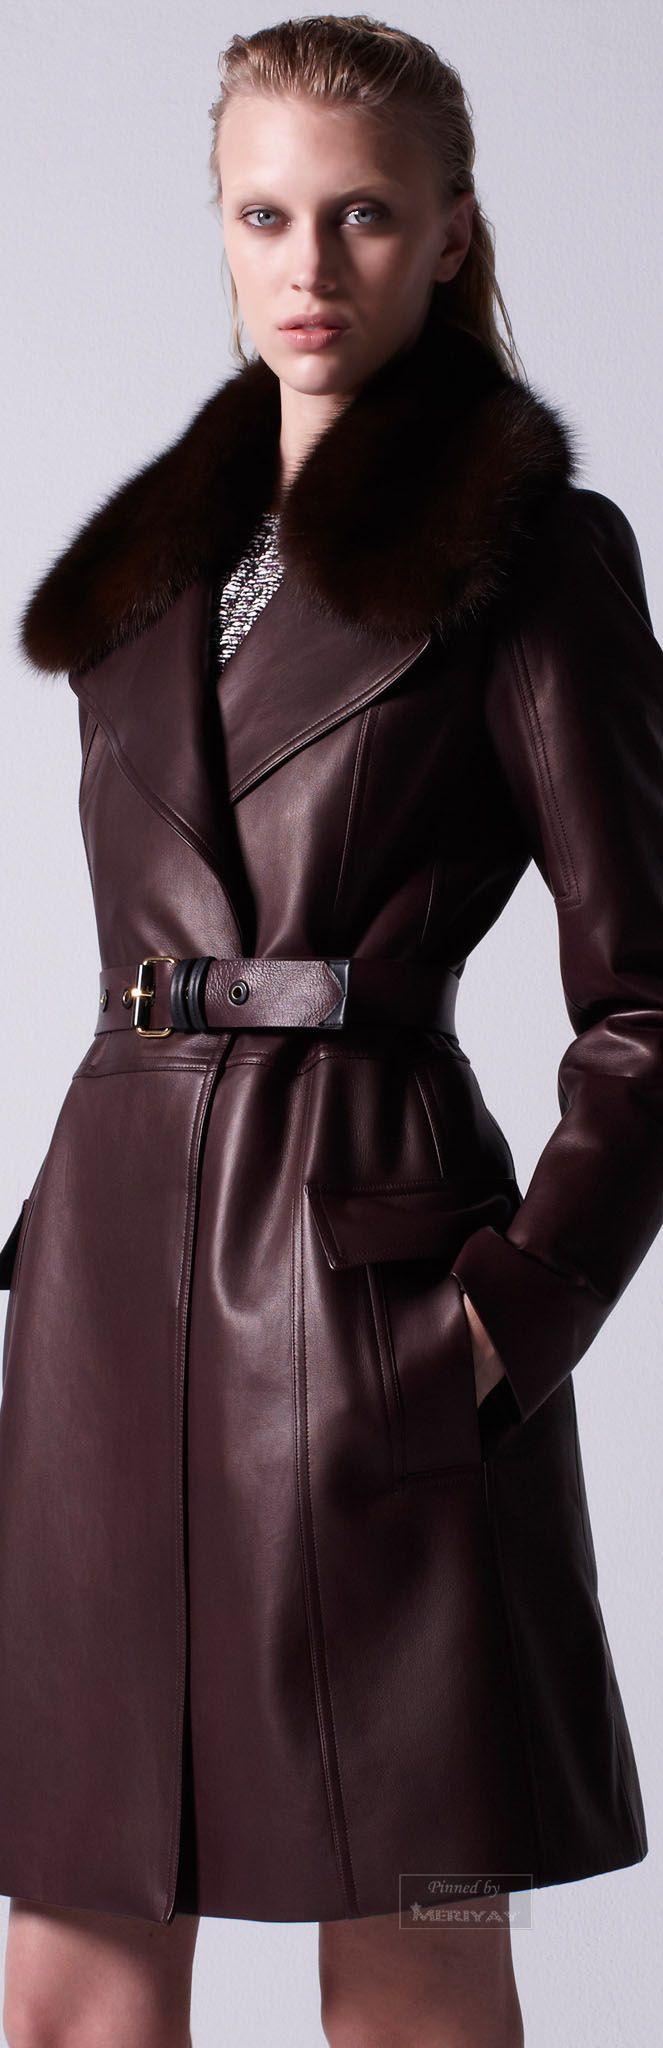 J. Mendel.PreFall 2015. Burgundy leather jacket